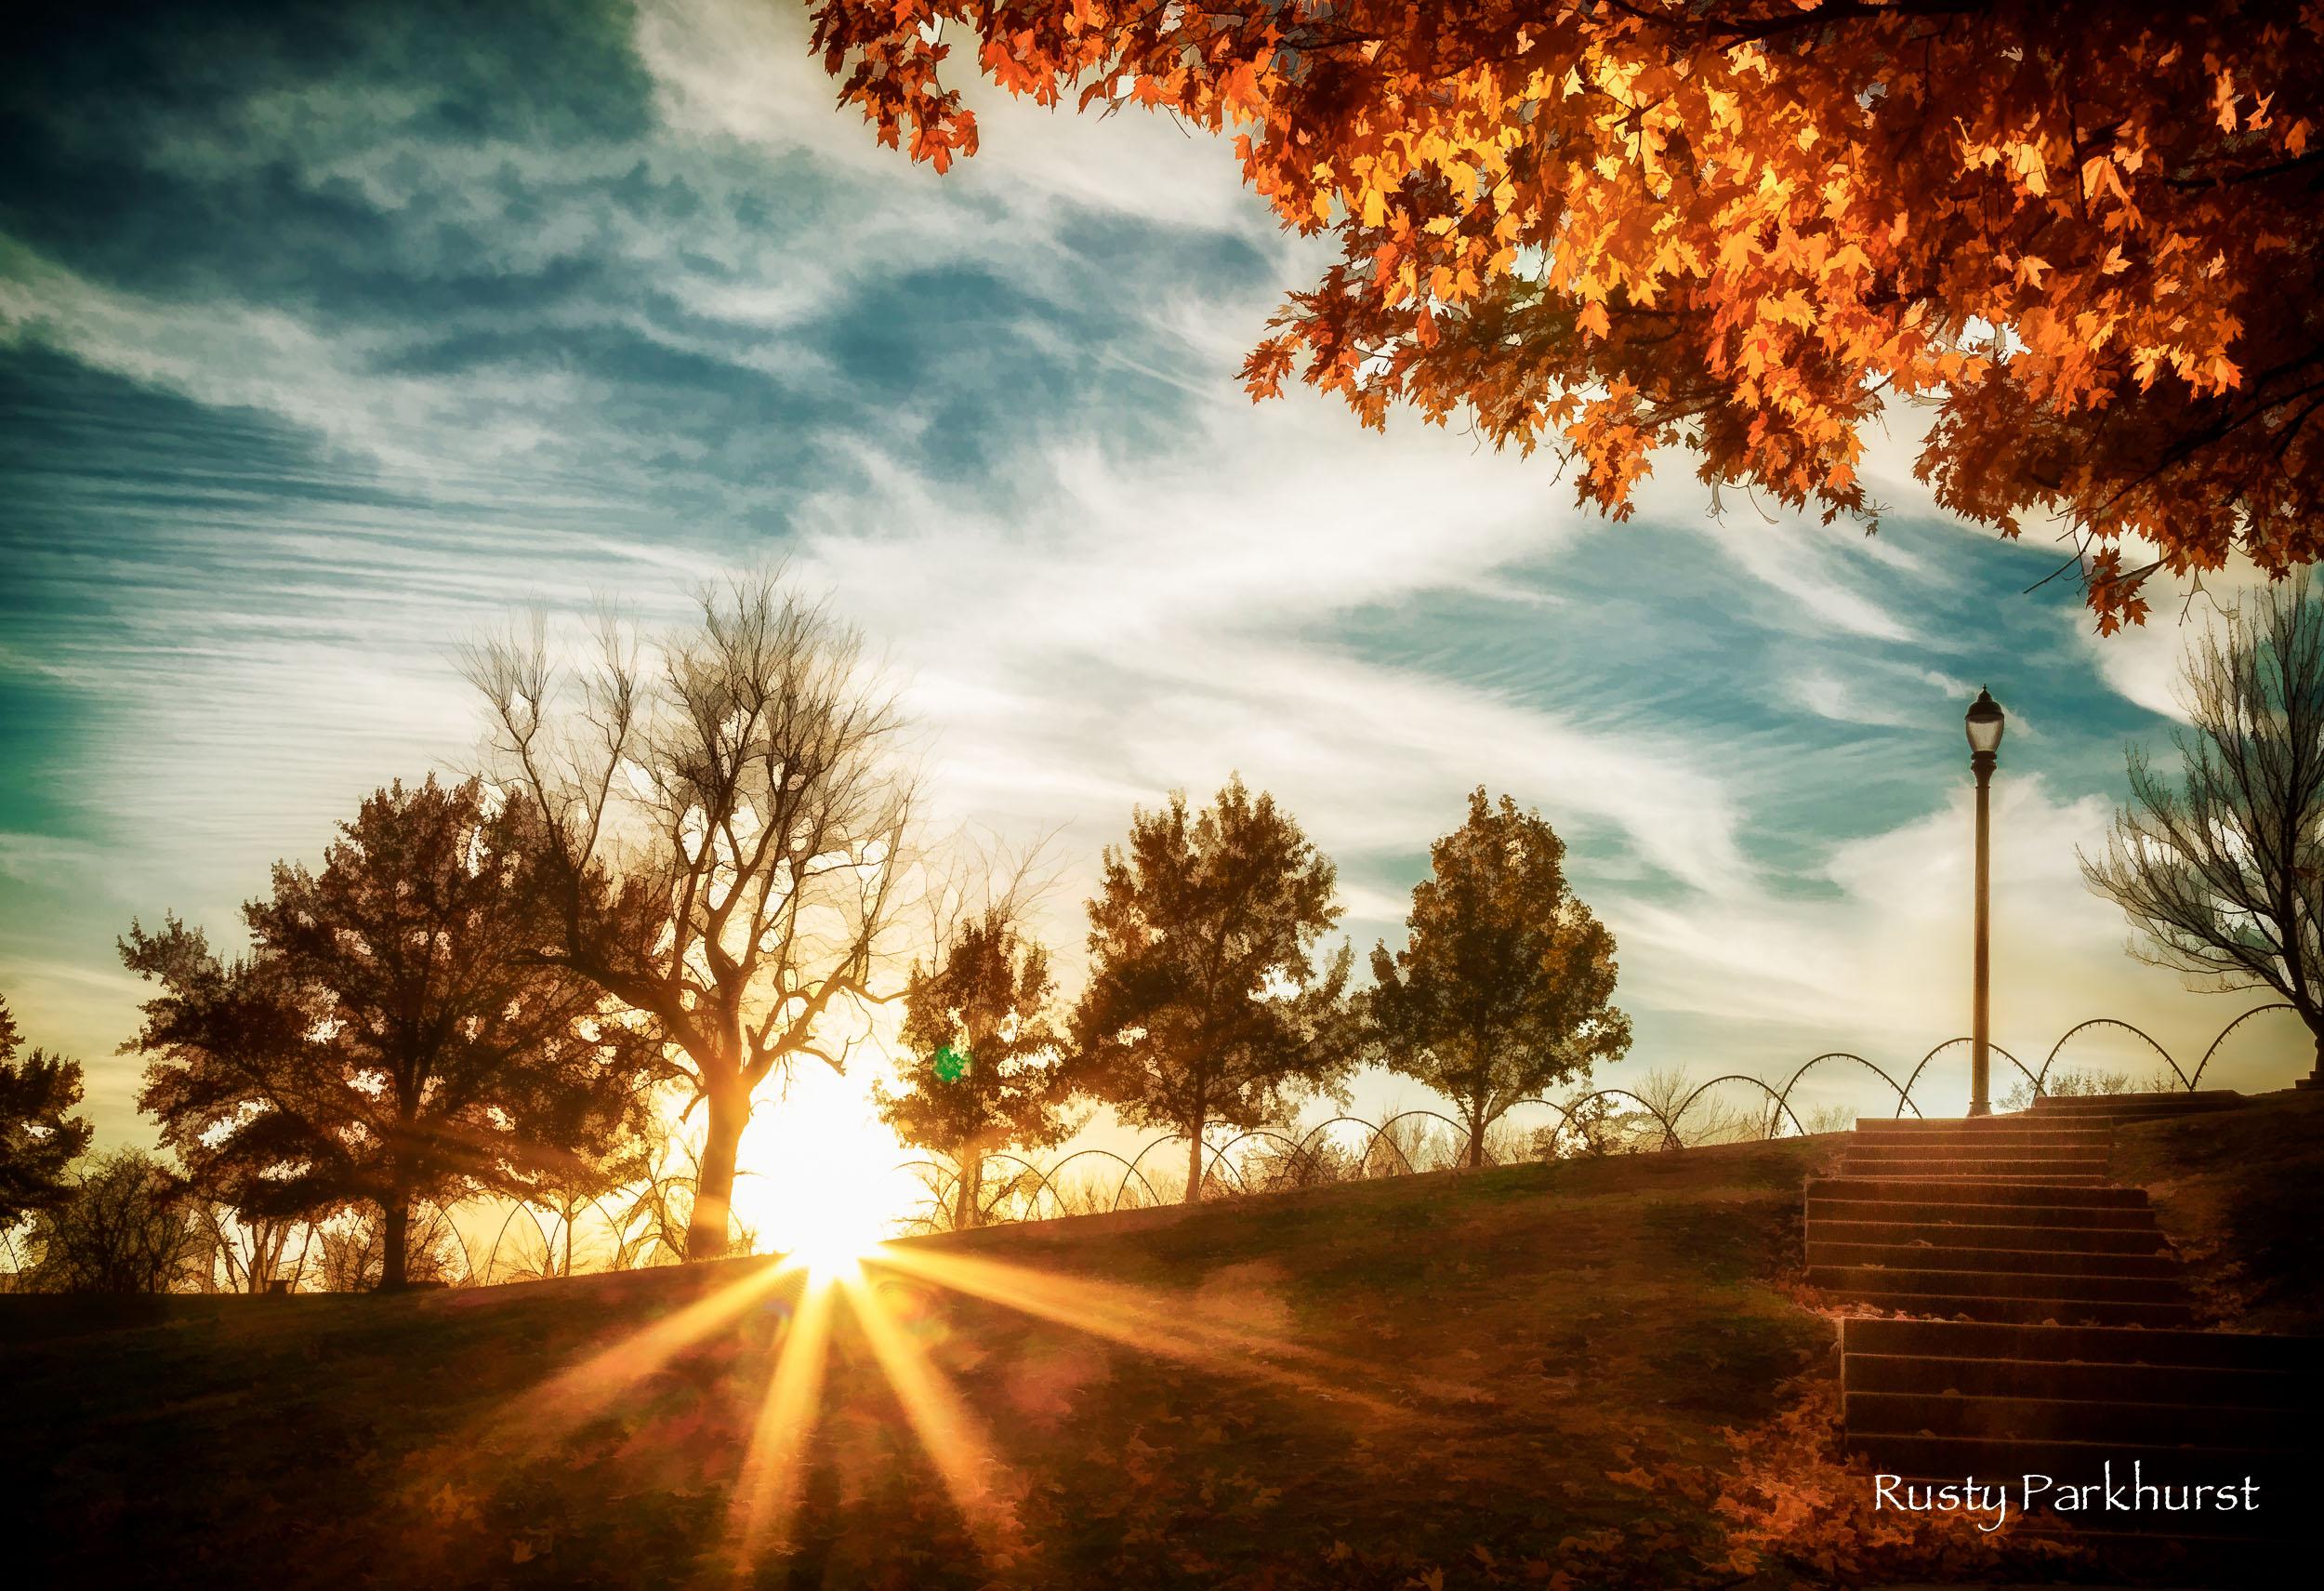 Krug Park Autumn